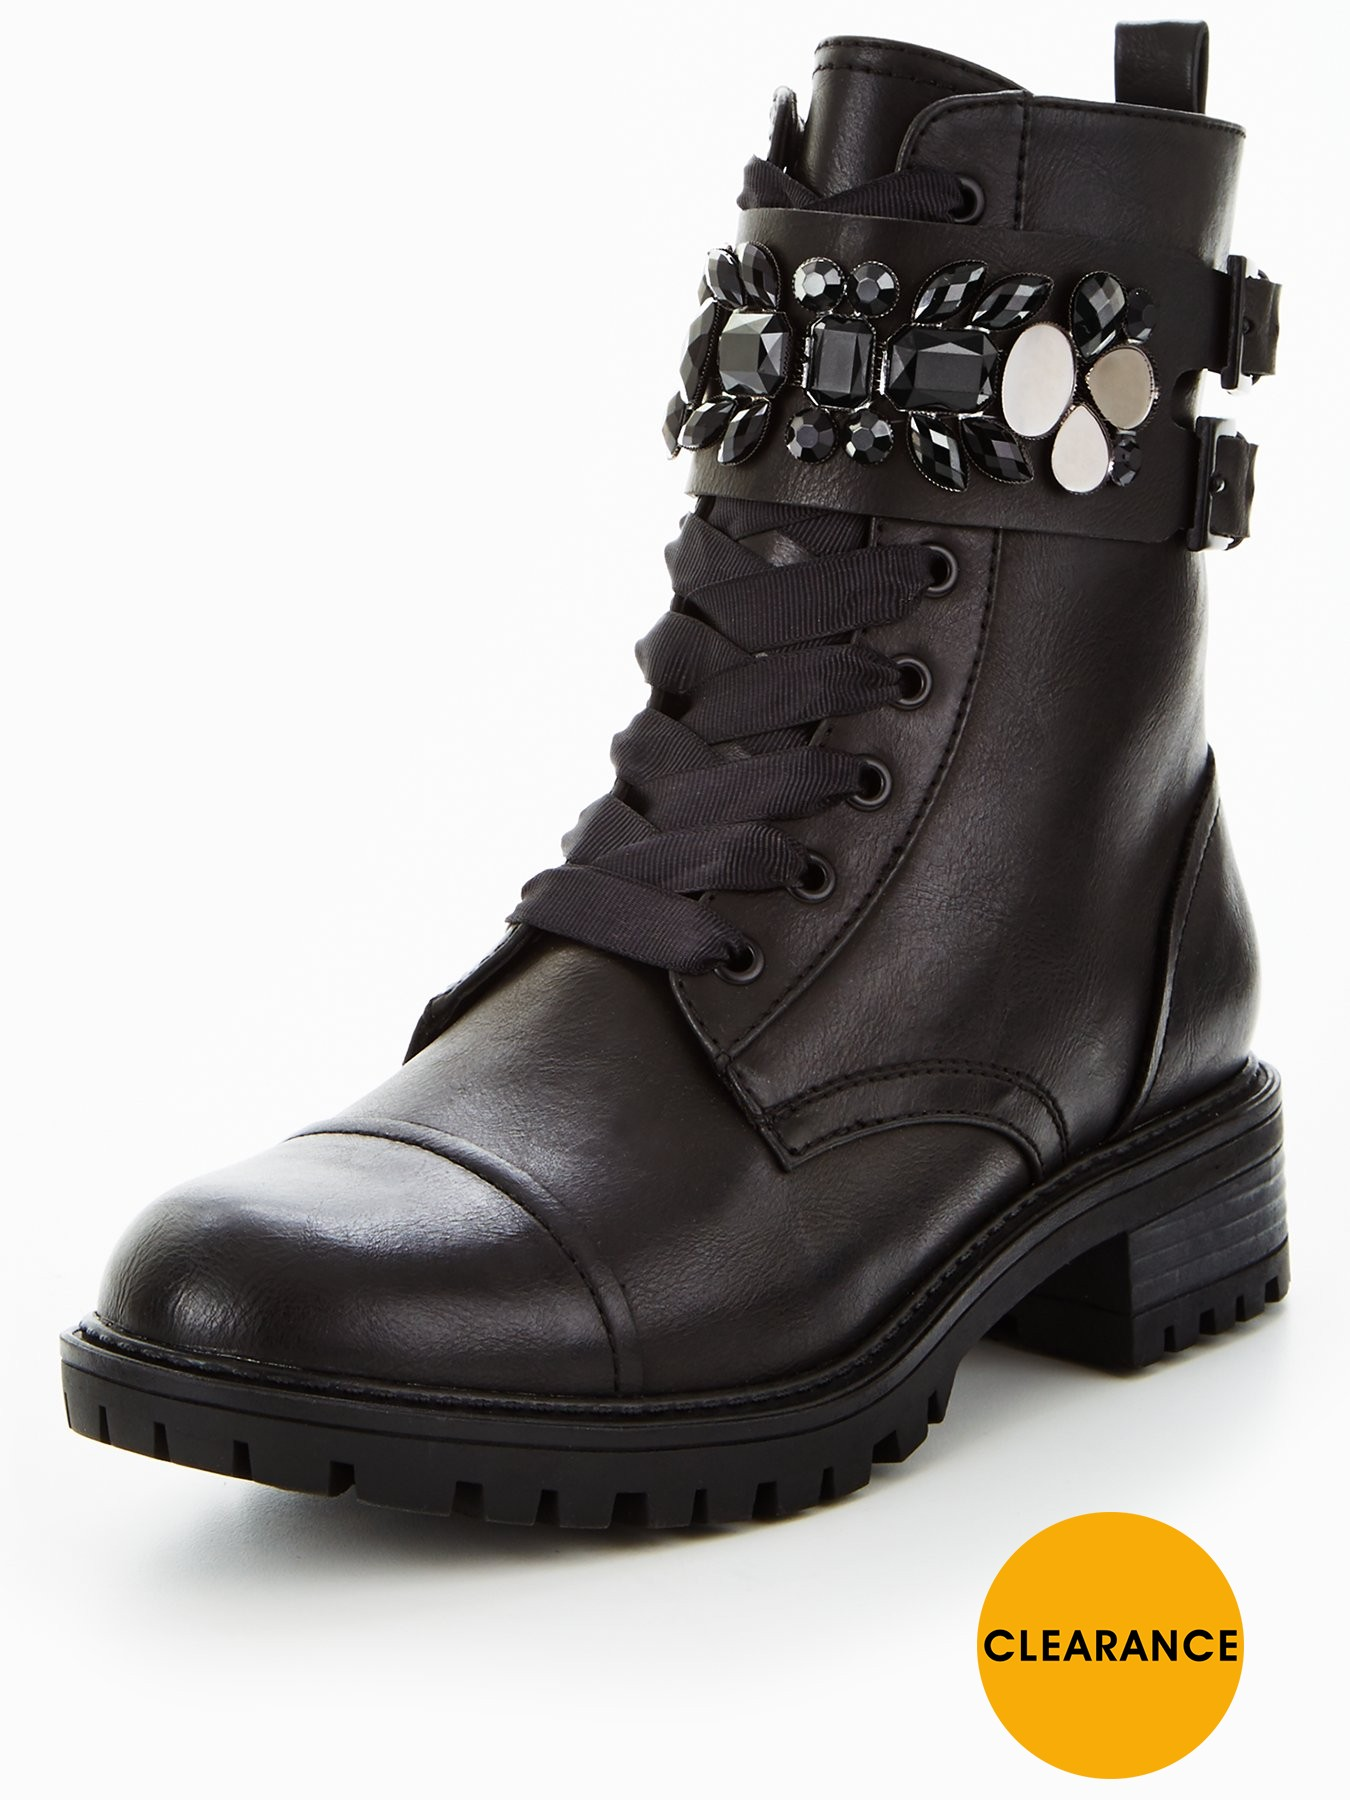 Miss KG Sax Biker Boot 1600179996 Women's Shoes Miss KG Boots